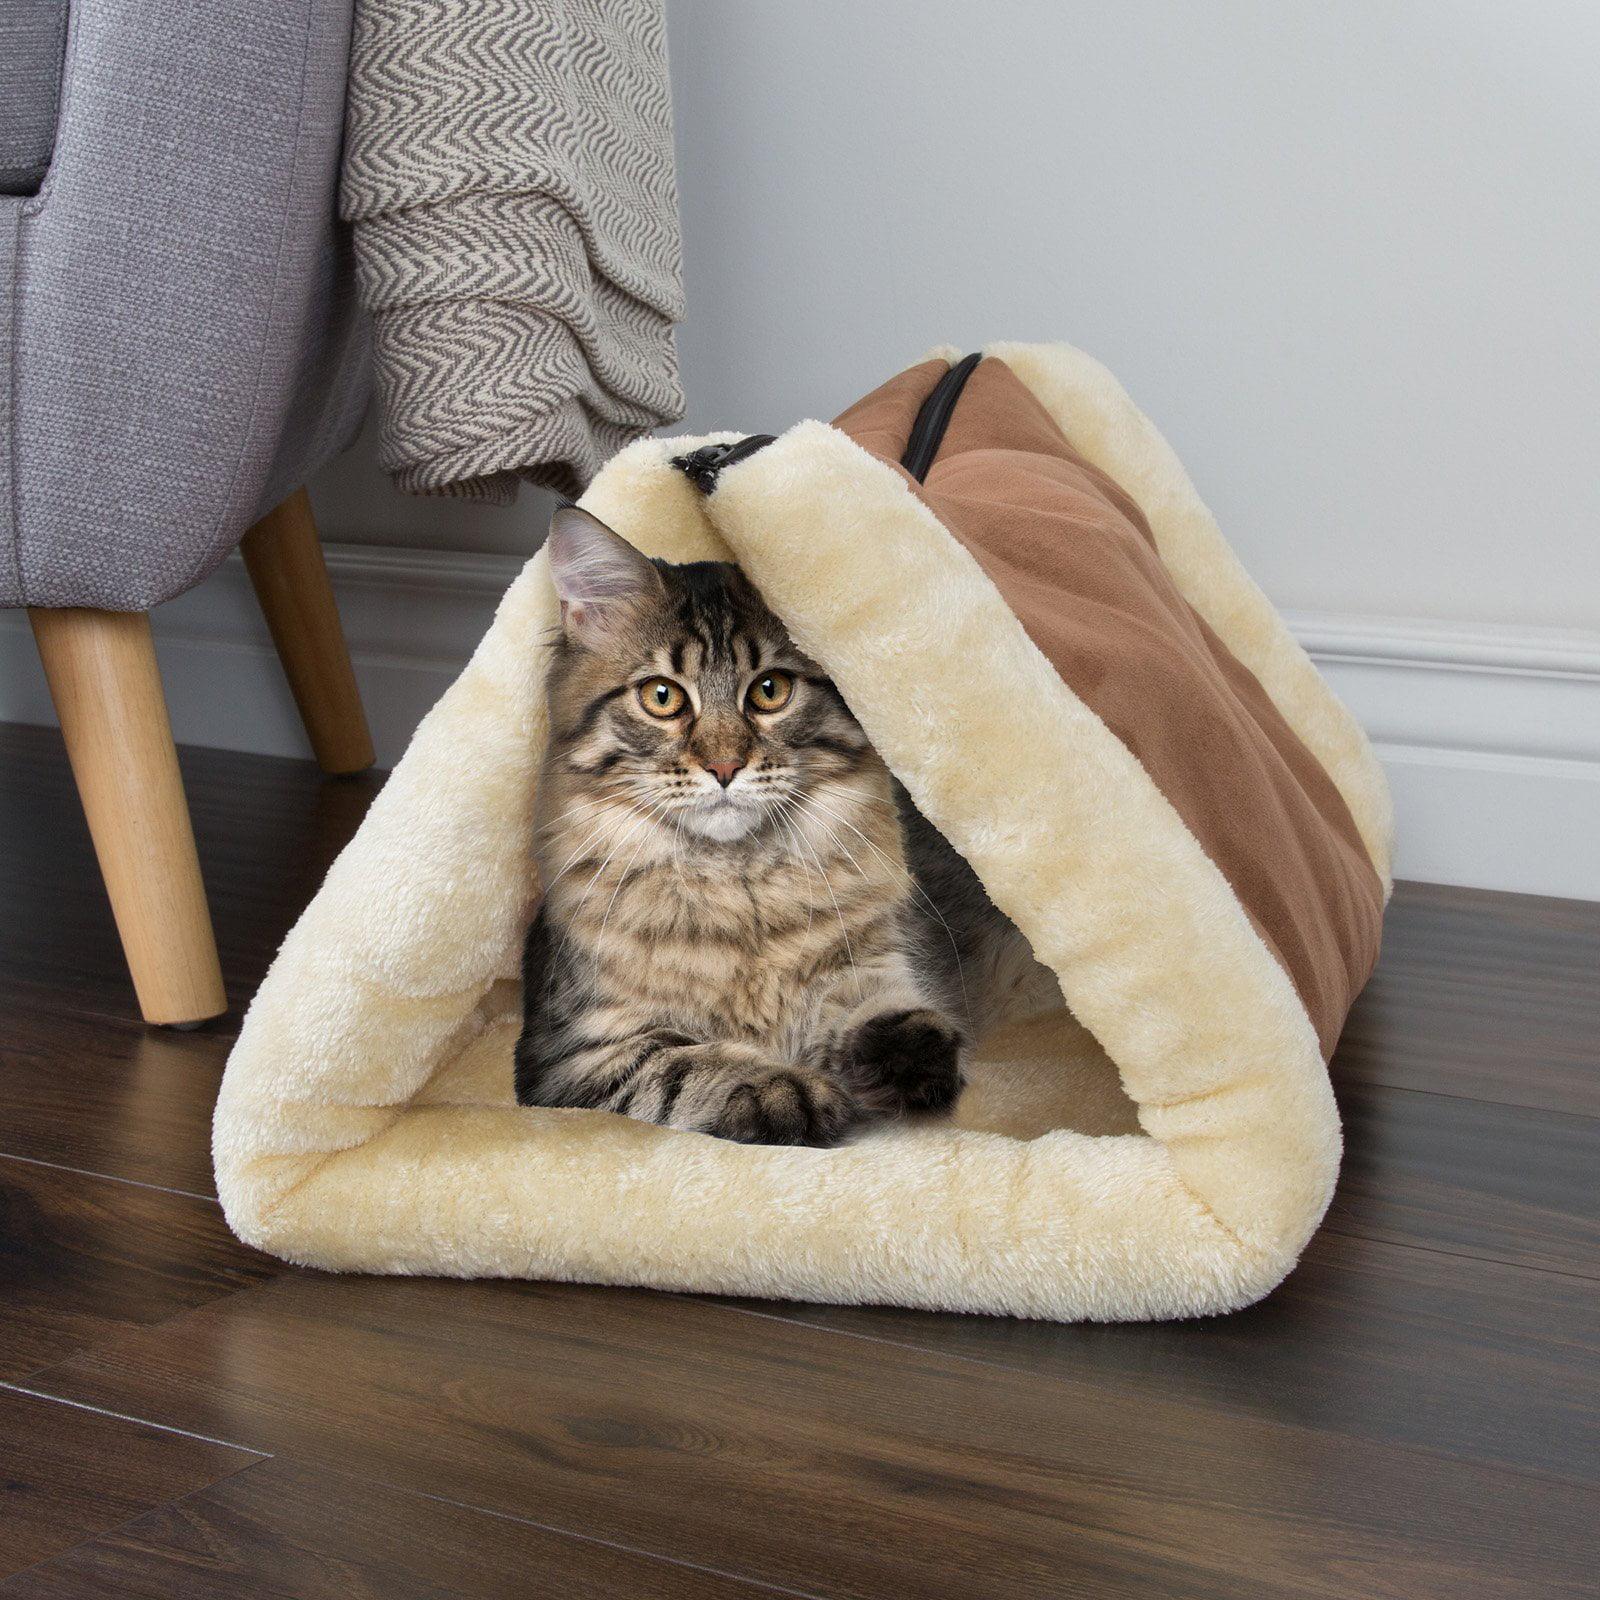 Petmaker Kitty Hut Cat Bed